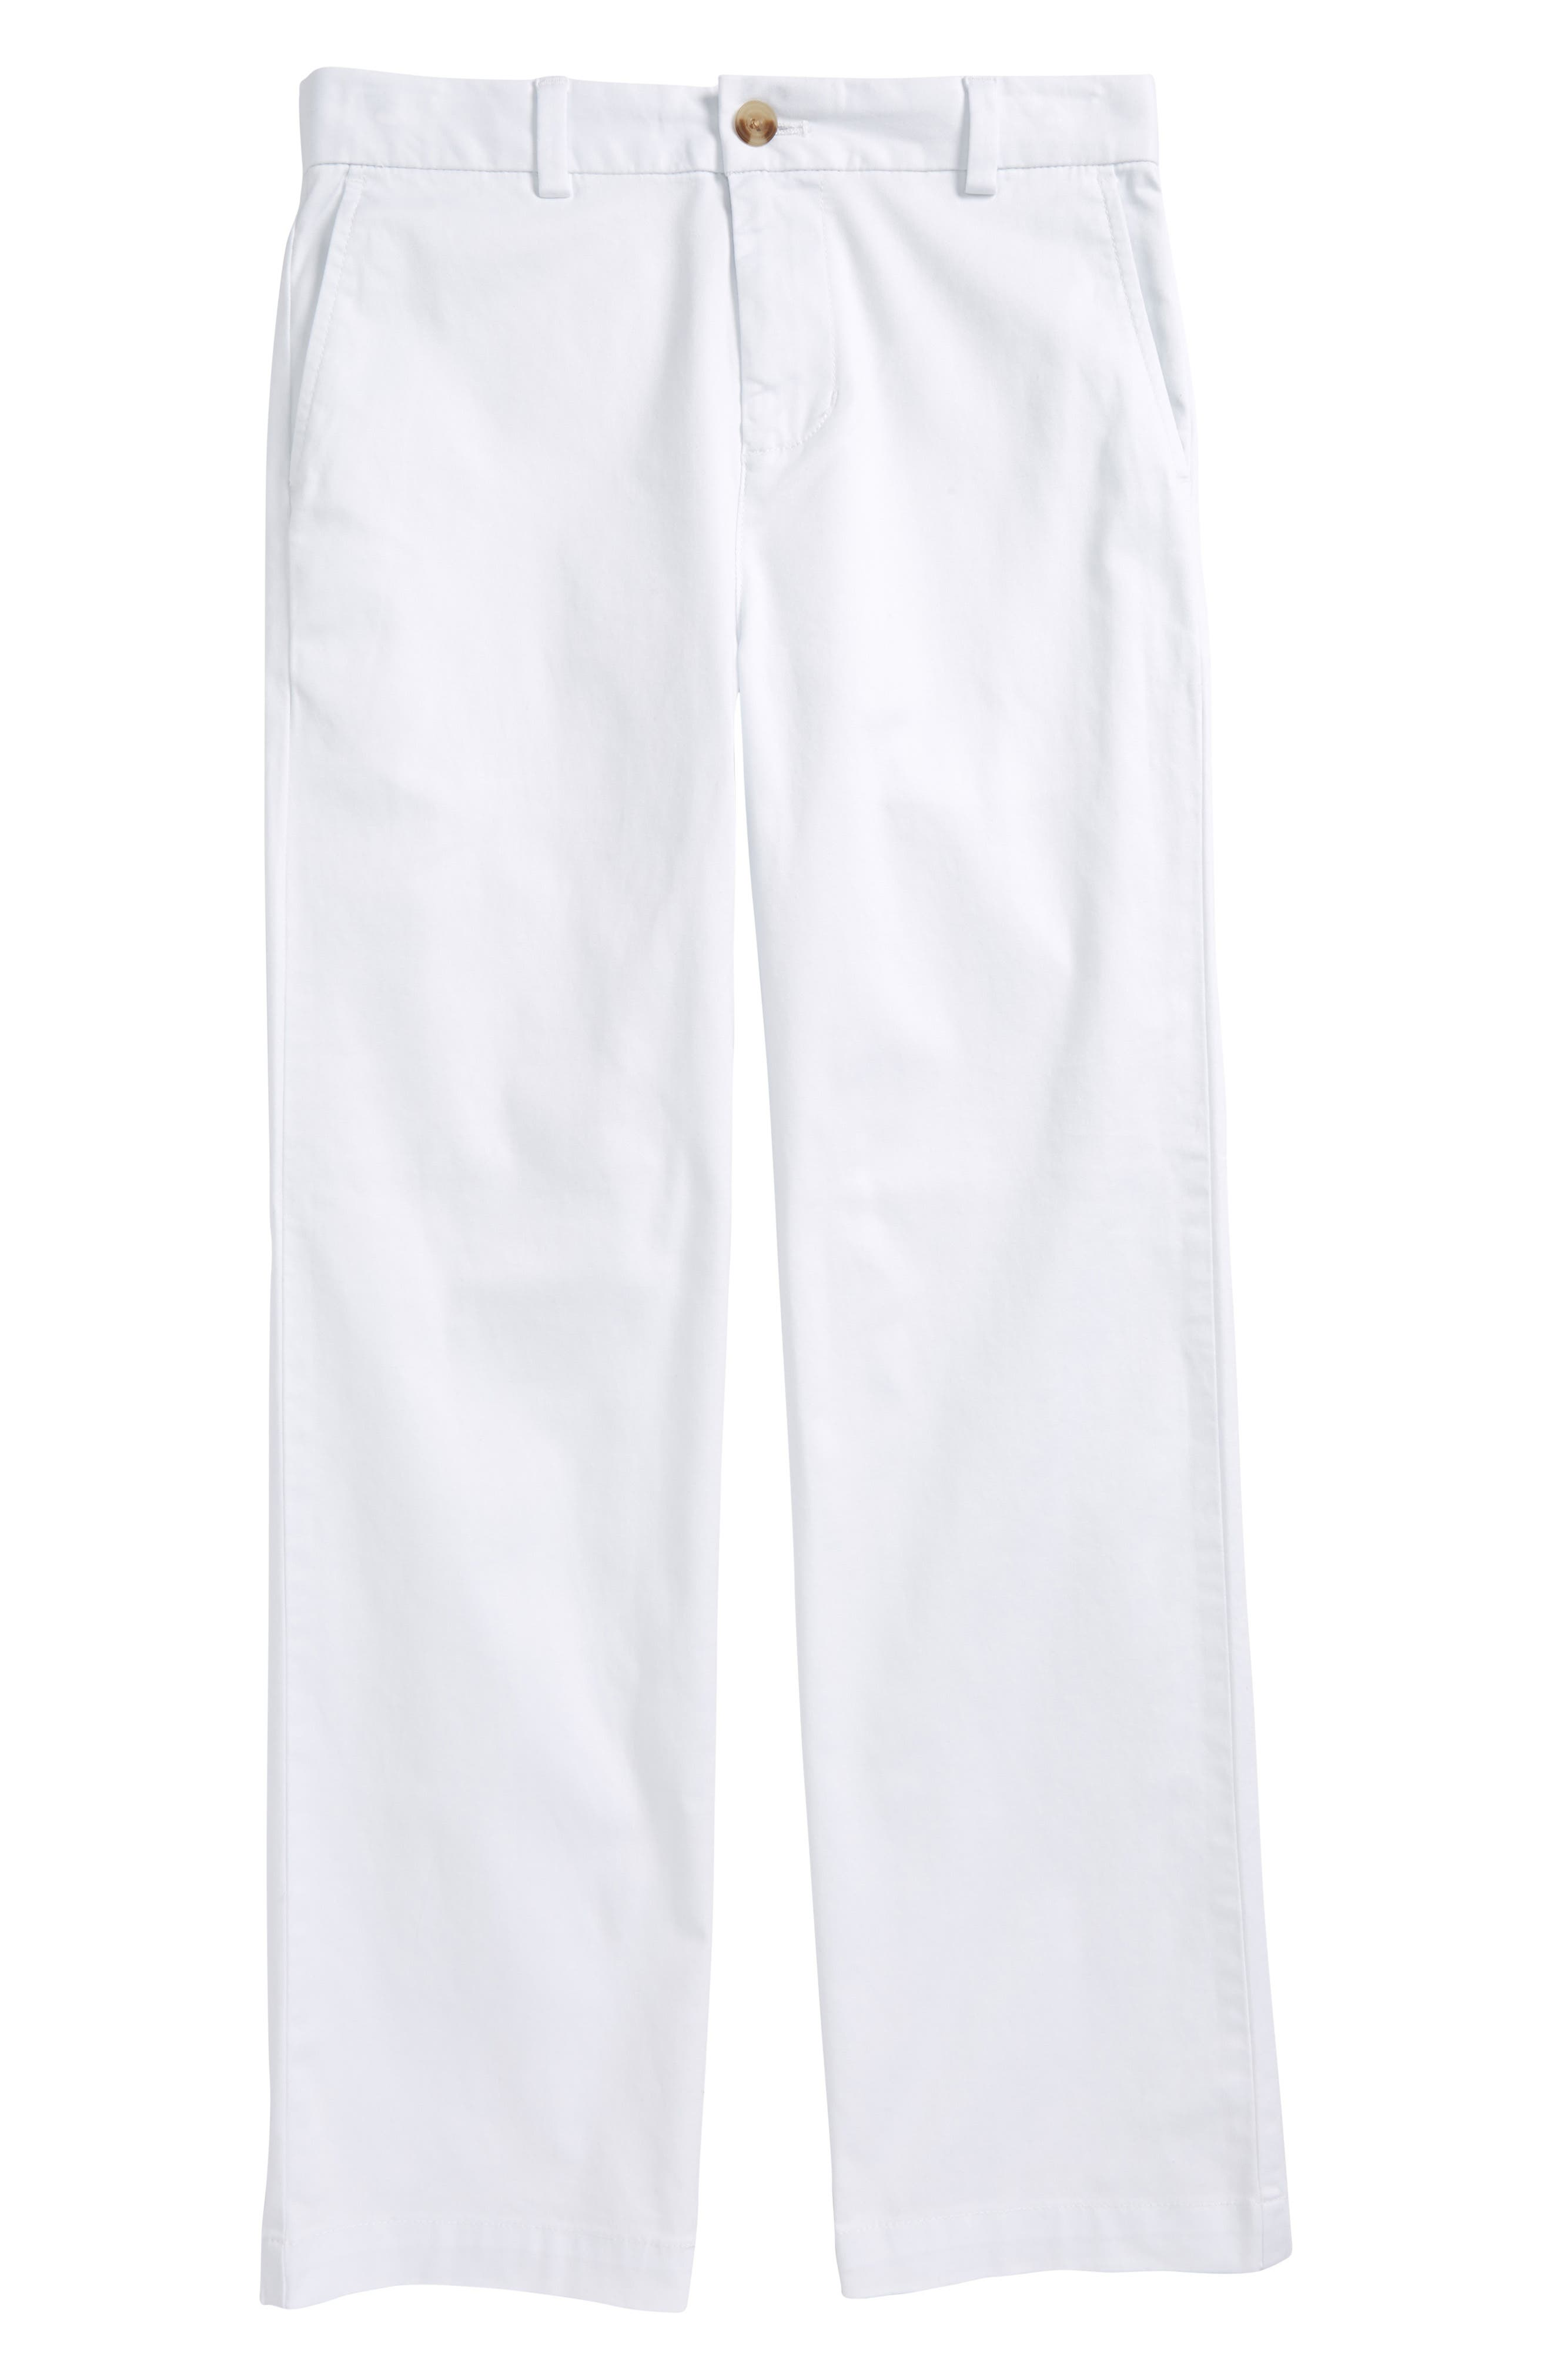 Stretch Breaker Pants,                             Main thumbnail 1, color,                             White Cap